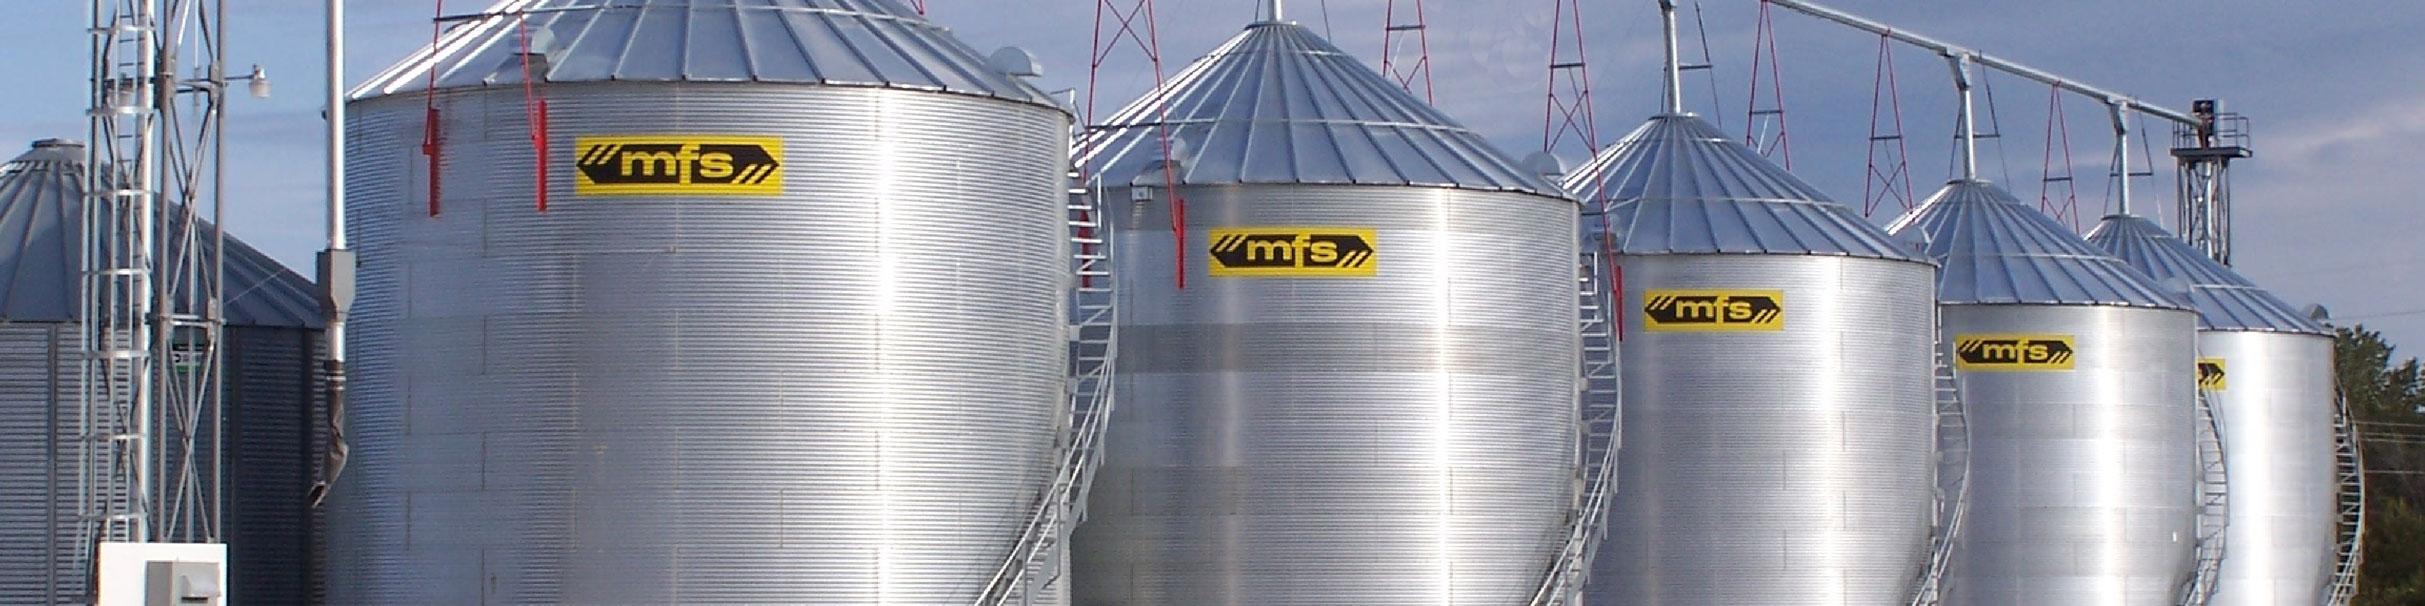 LOOP-2 silos MFS